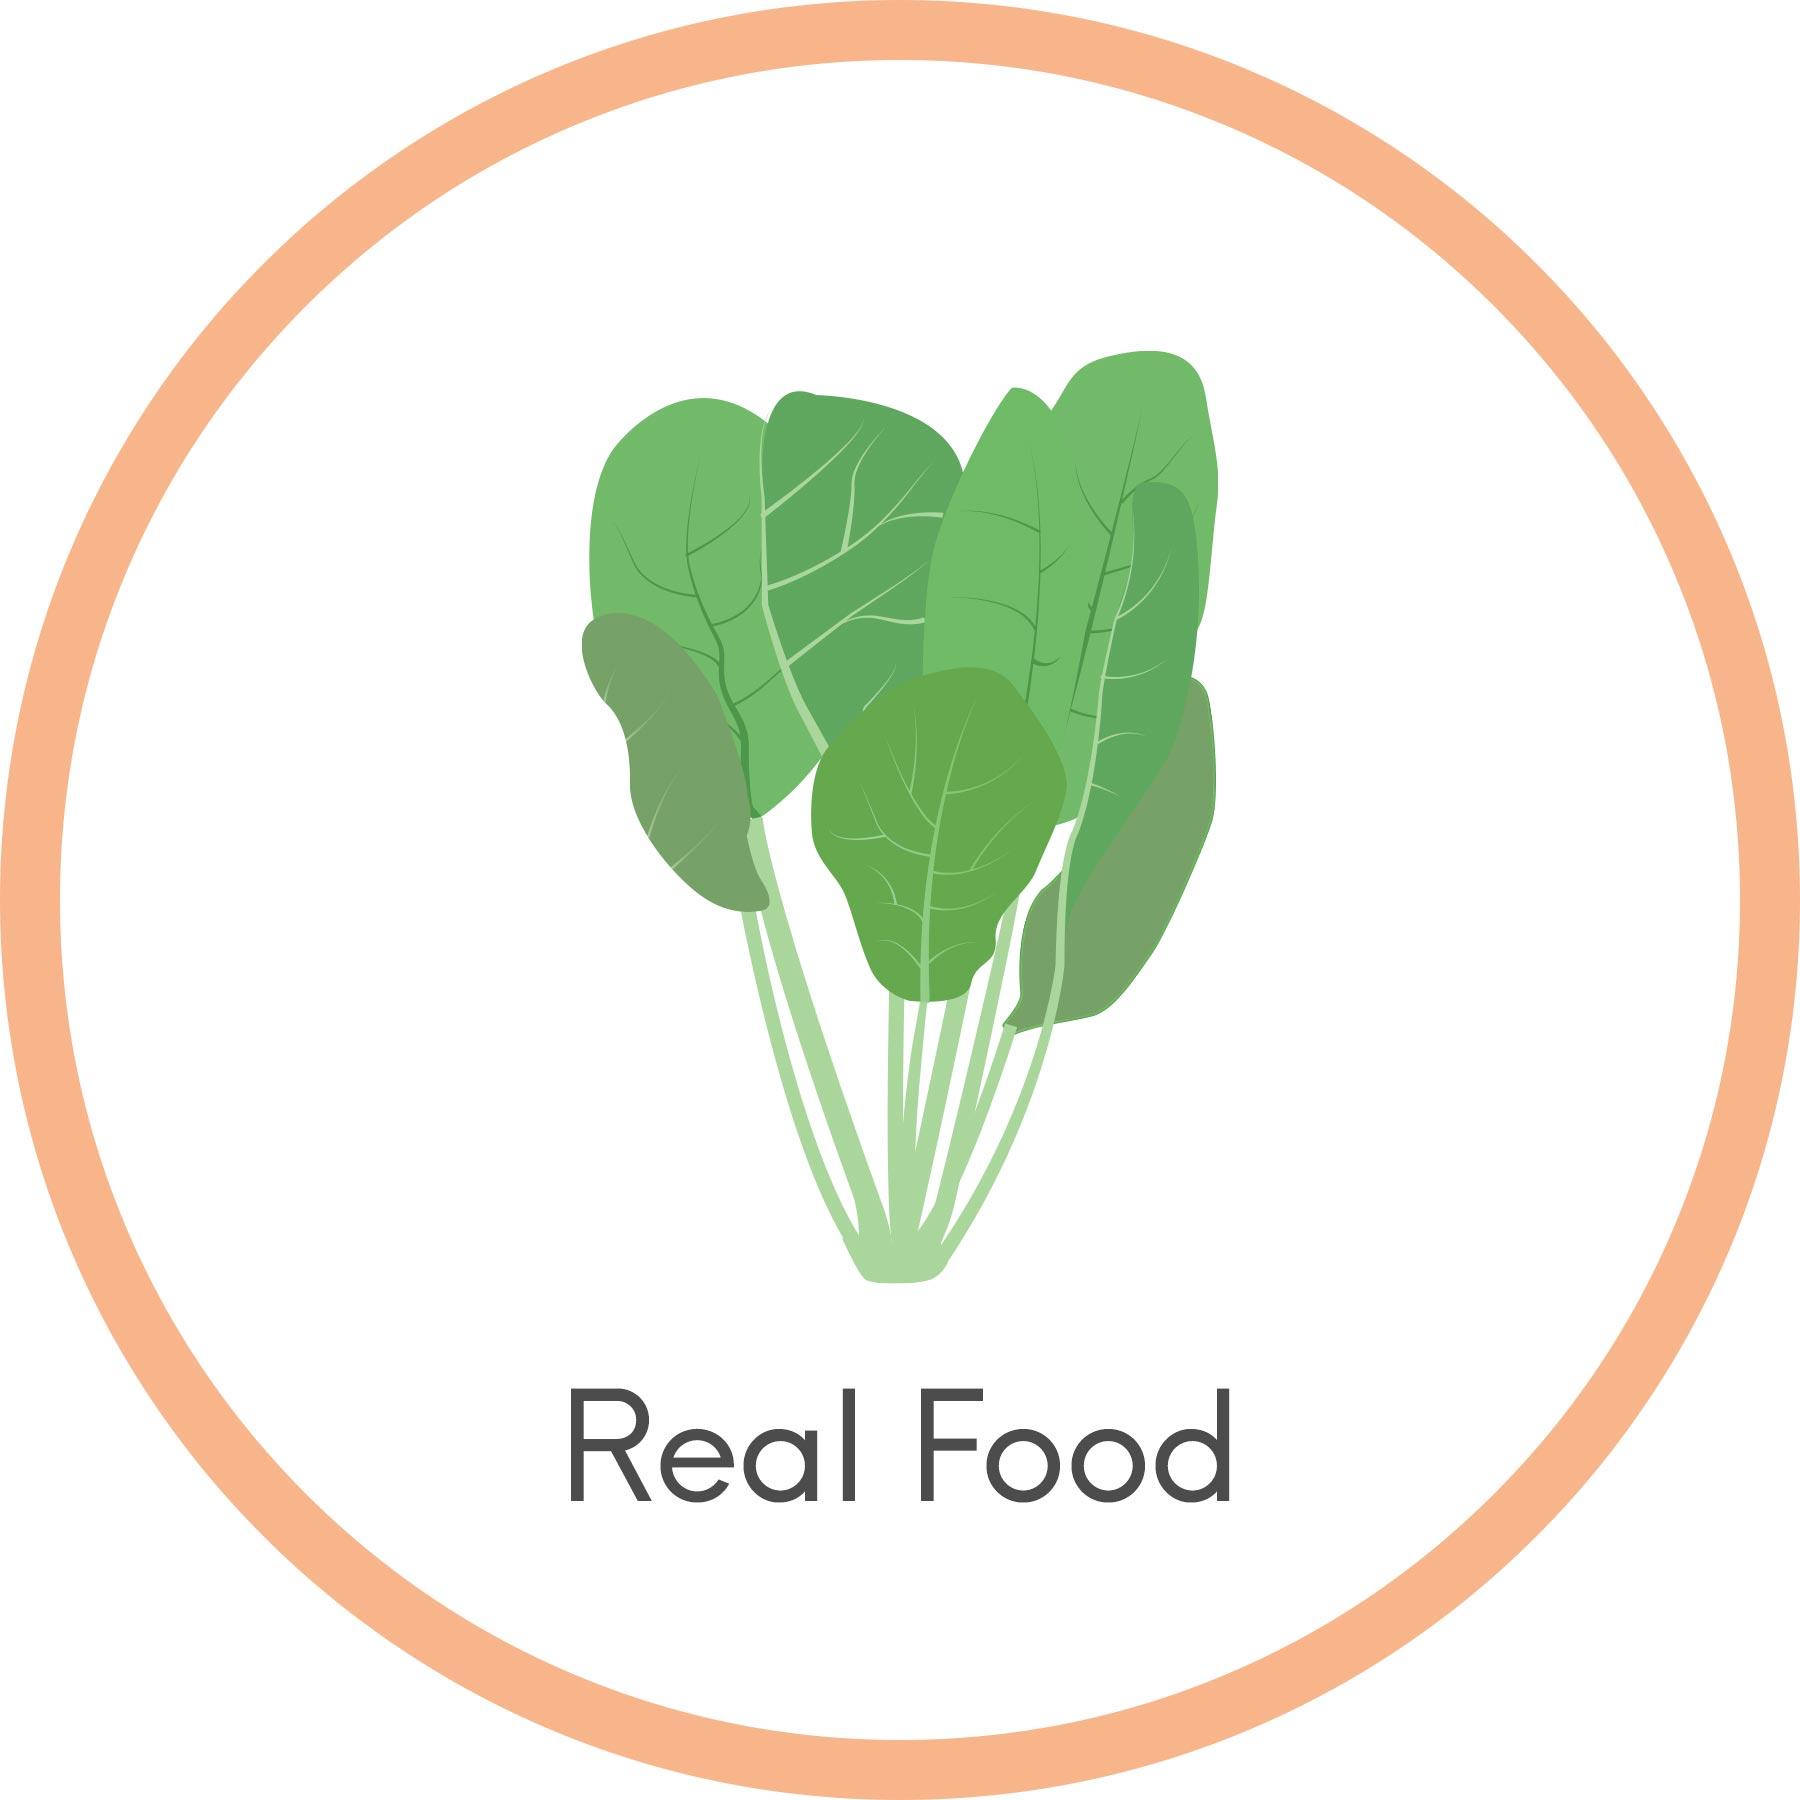 Real Food